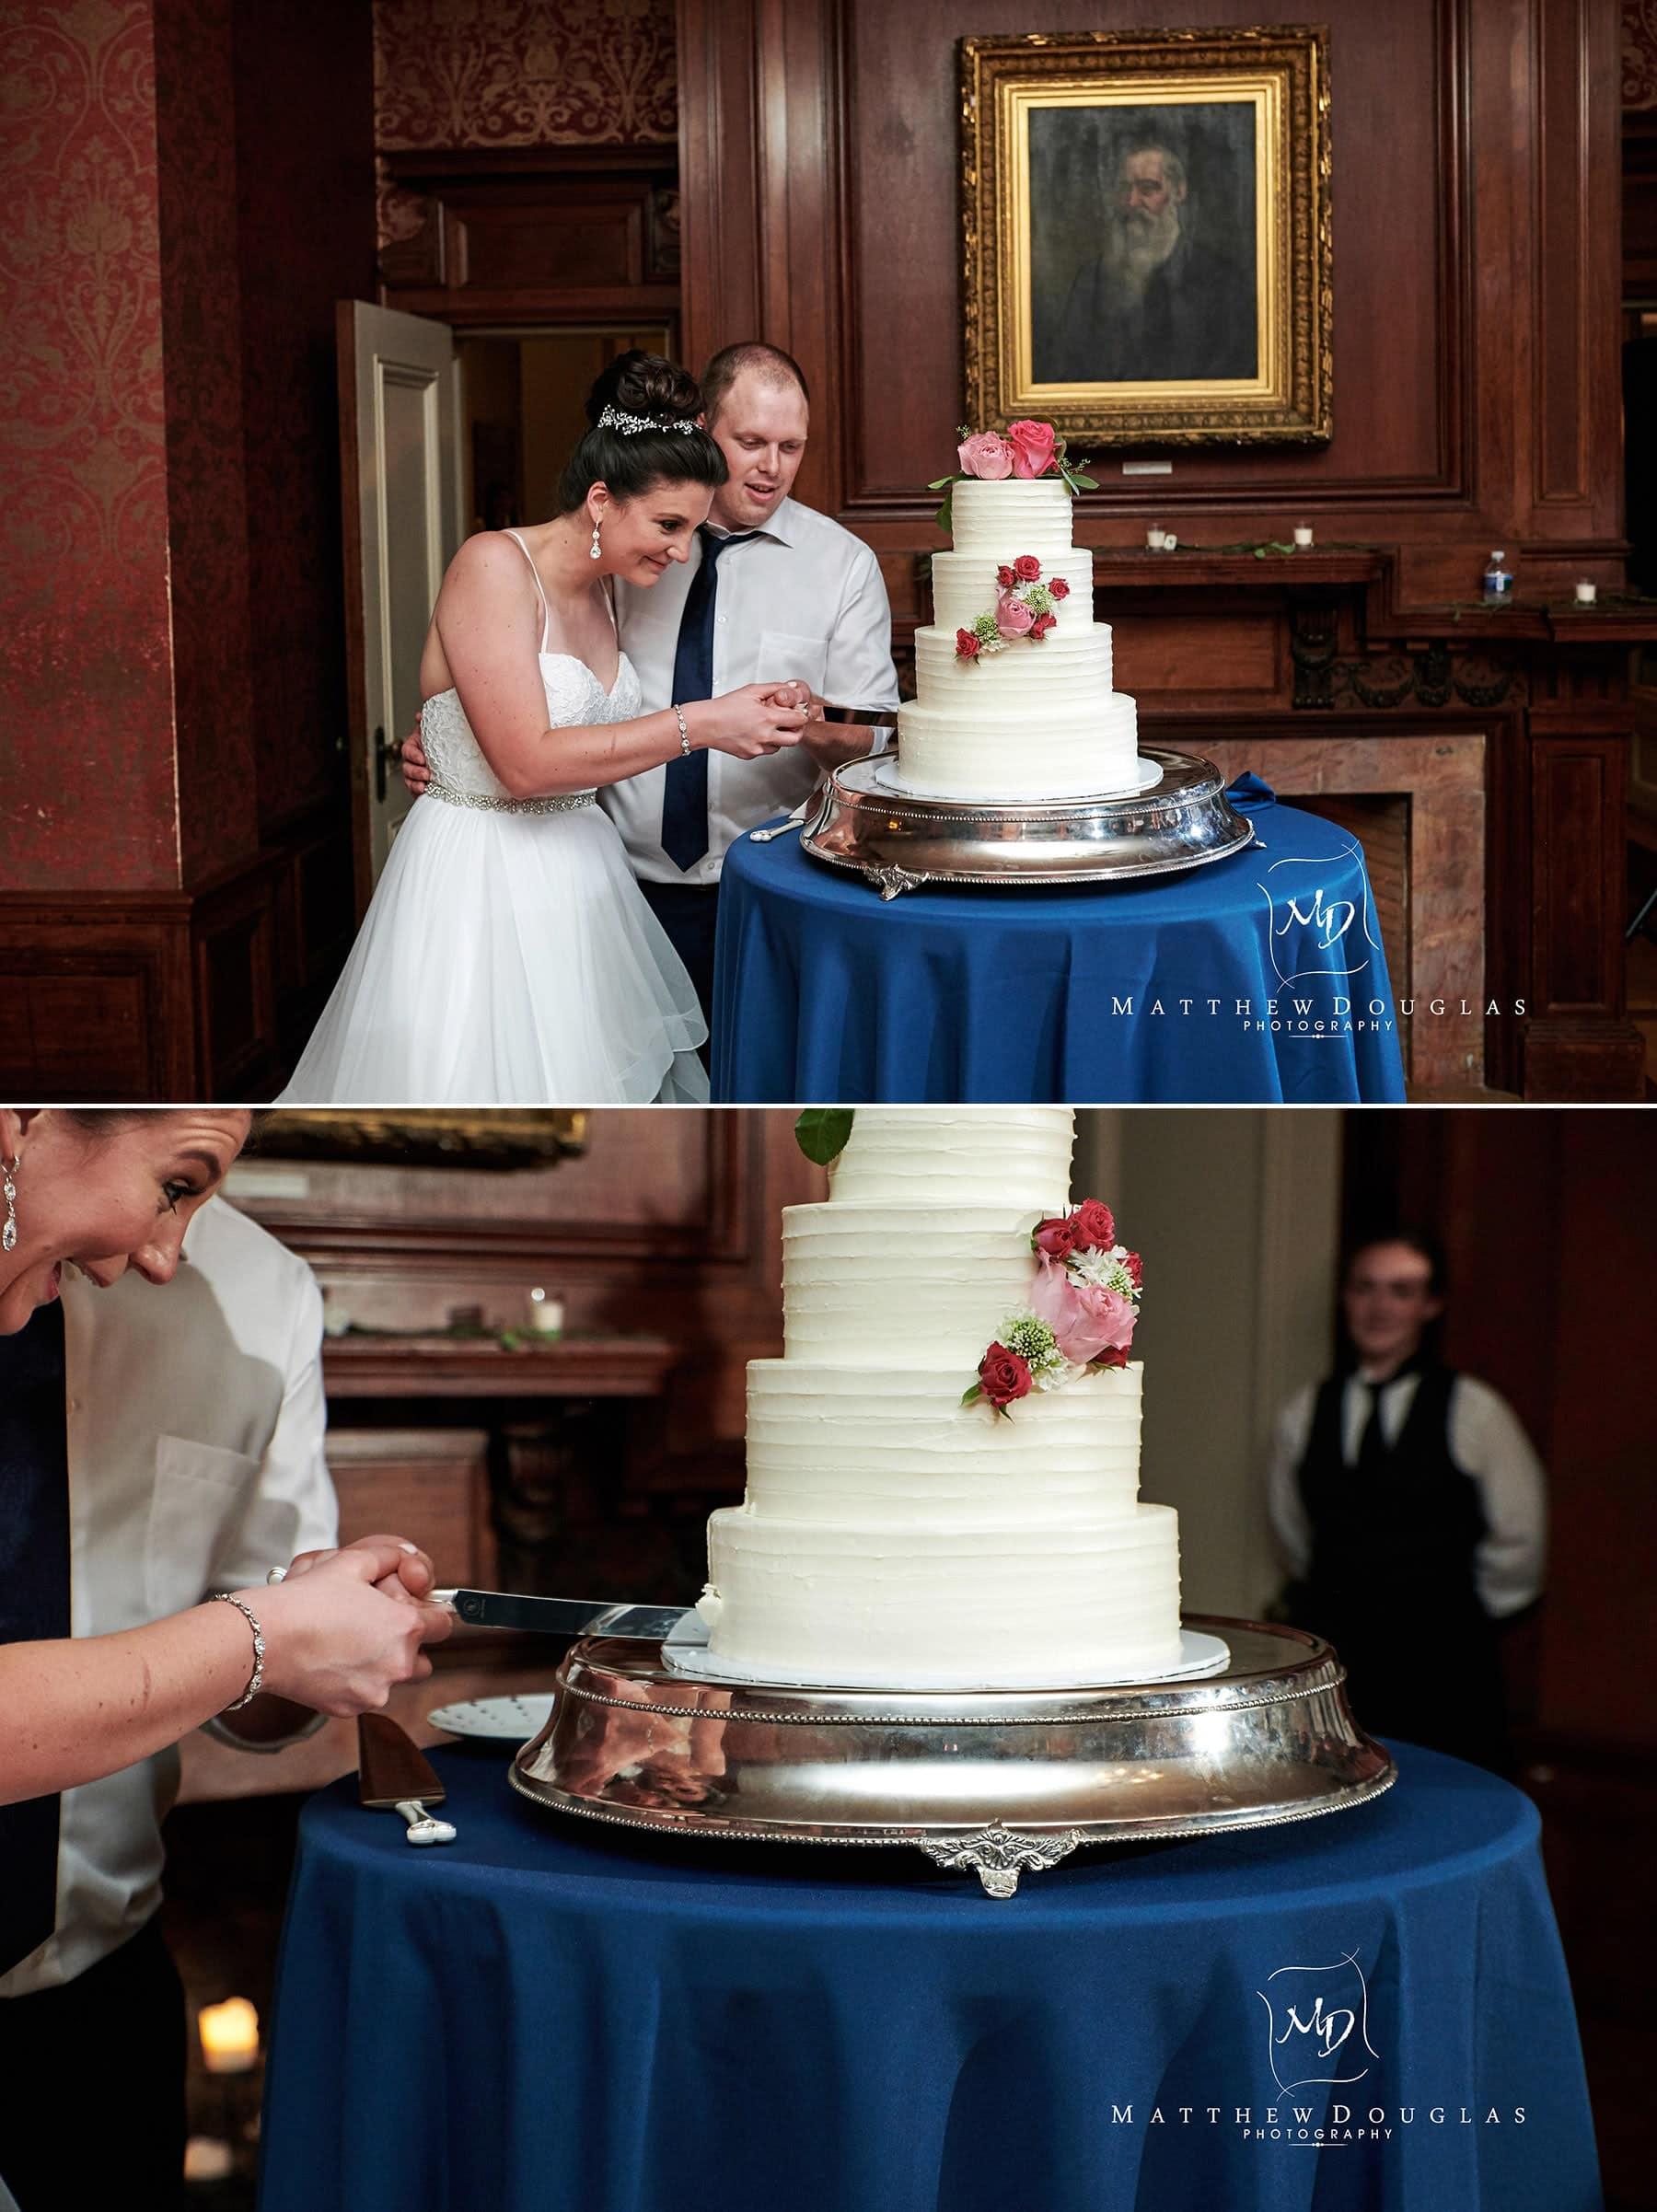 cairnwood estate wedding cake cutting